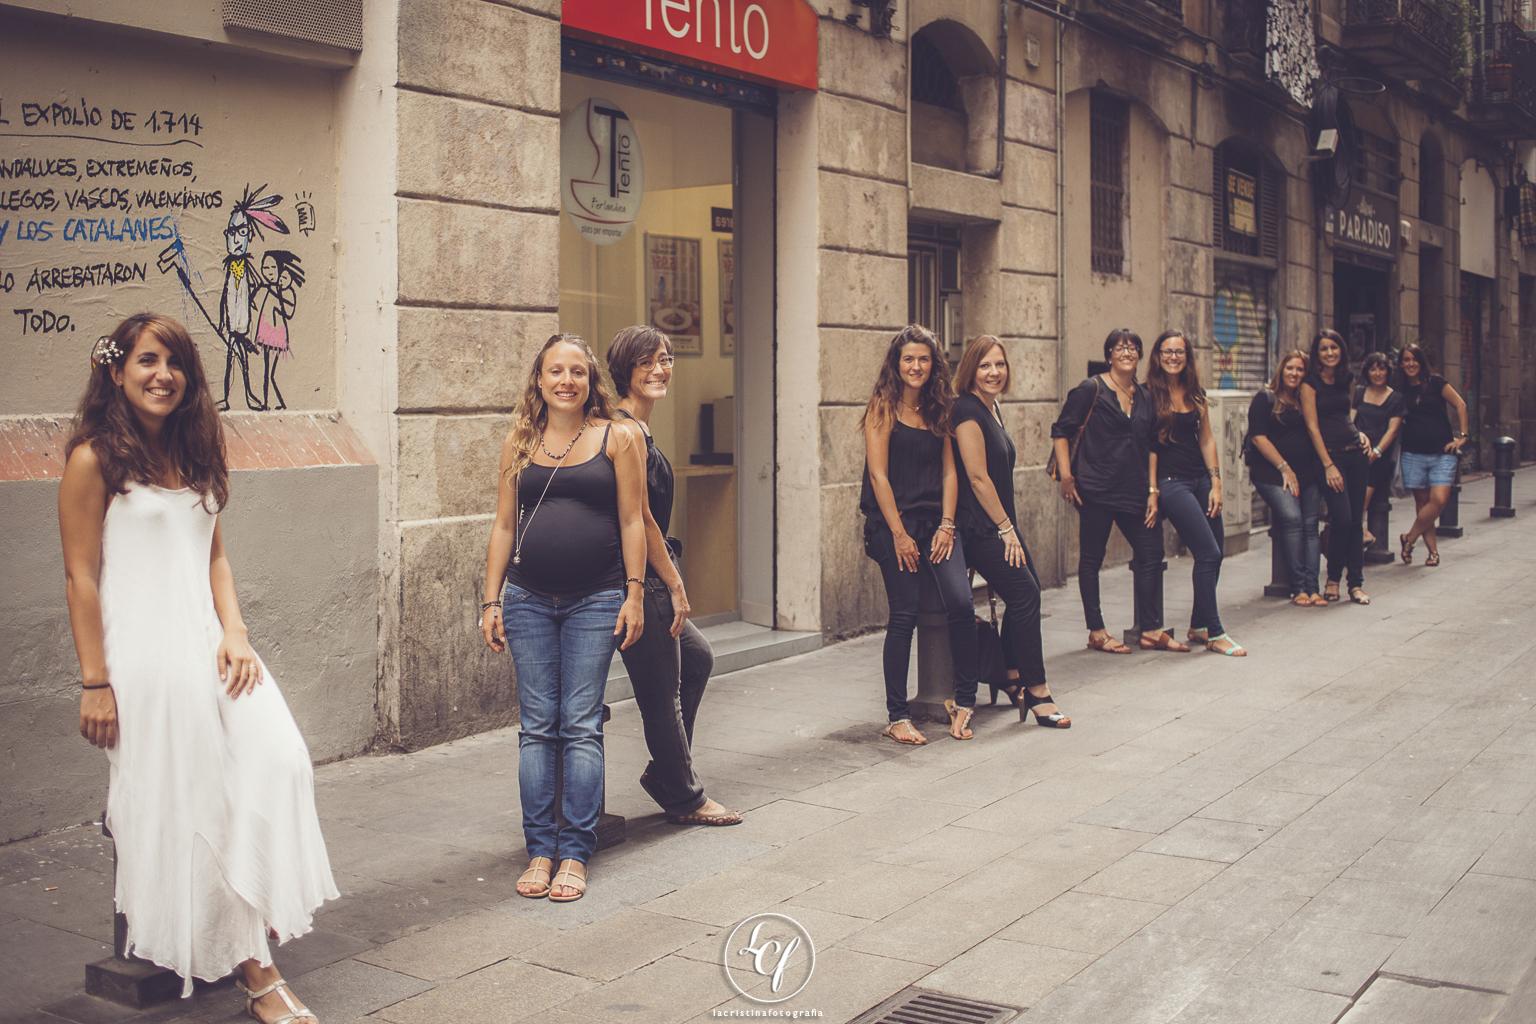 reportaje despedida de soltera barcelona :: fotografías despedida de soltera :: reportaje barcelonareportaje despedida de soltera barcelona :: fotografías despedida de soltera :: reportaje barcelona